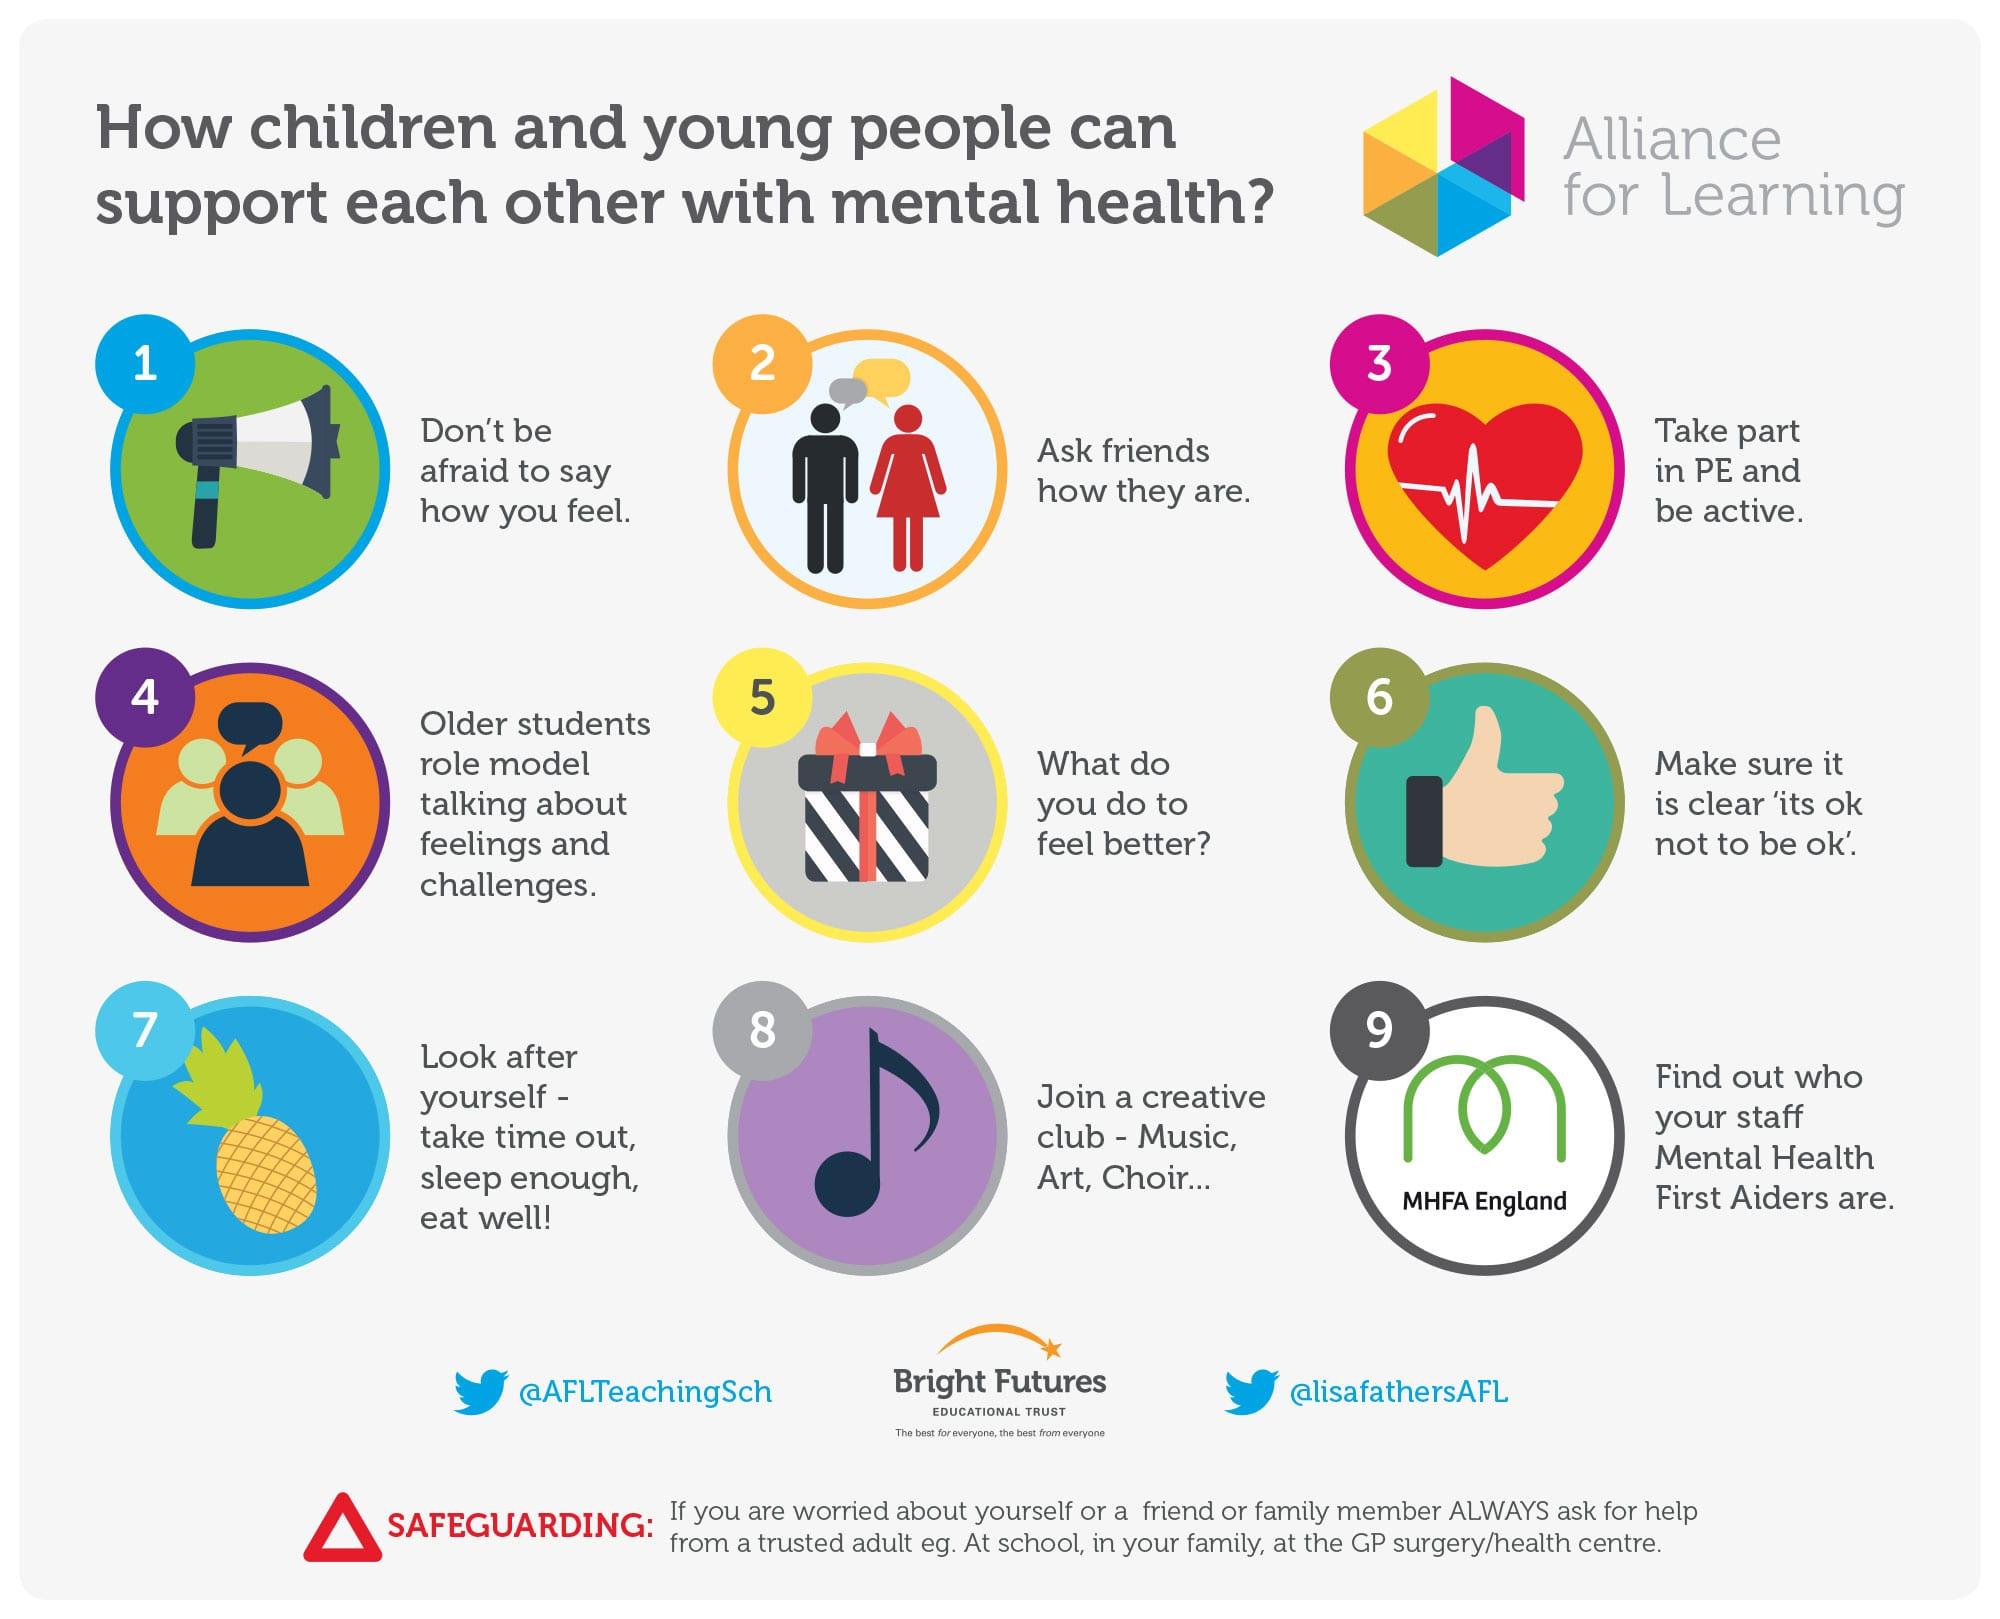 AFL_ChildMentalHealth-Infographic-v3